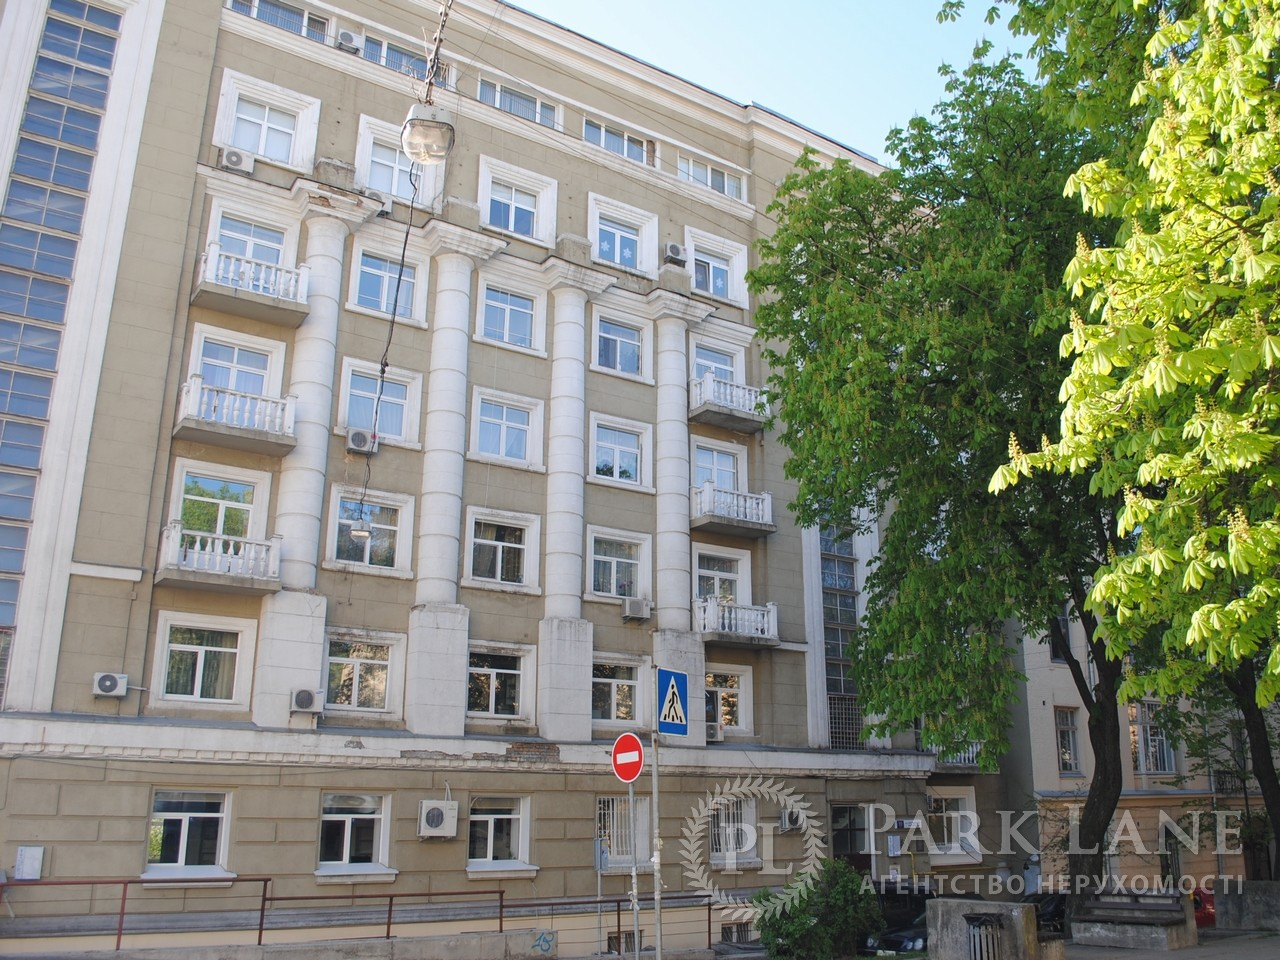 Квартира ул. Костельная, 10, Киев, K-29686 - Фото 23